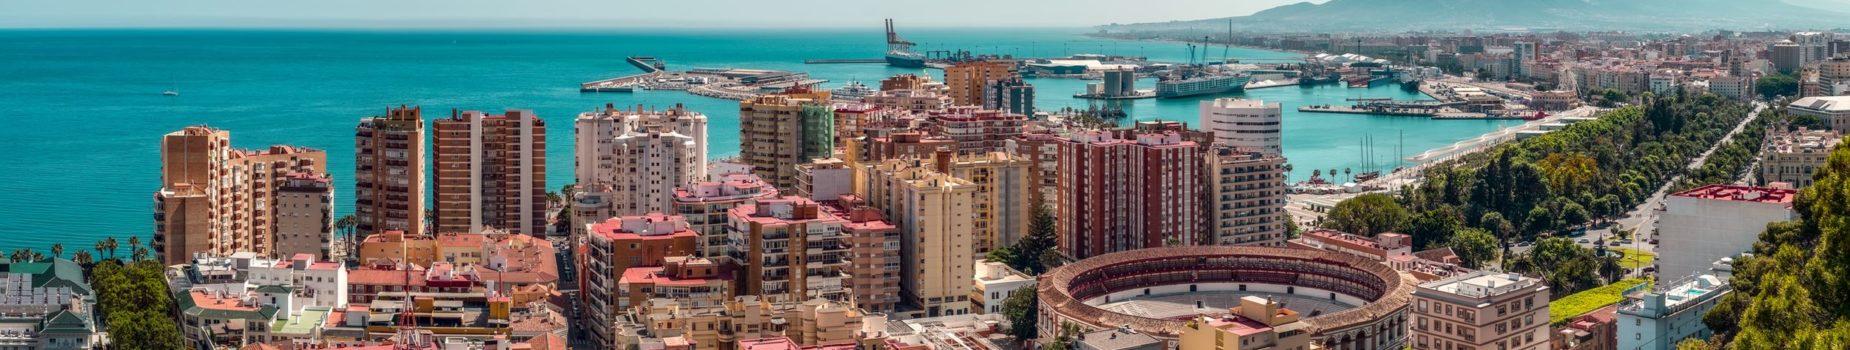 Fly Drive Malaga